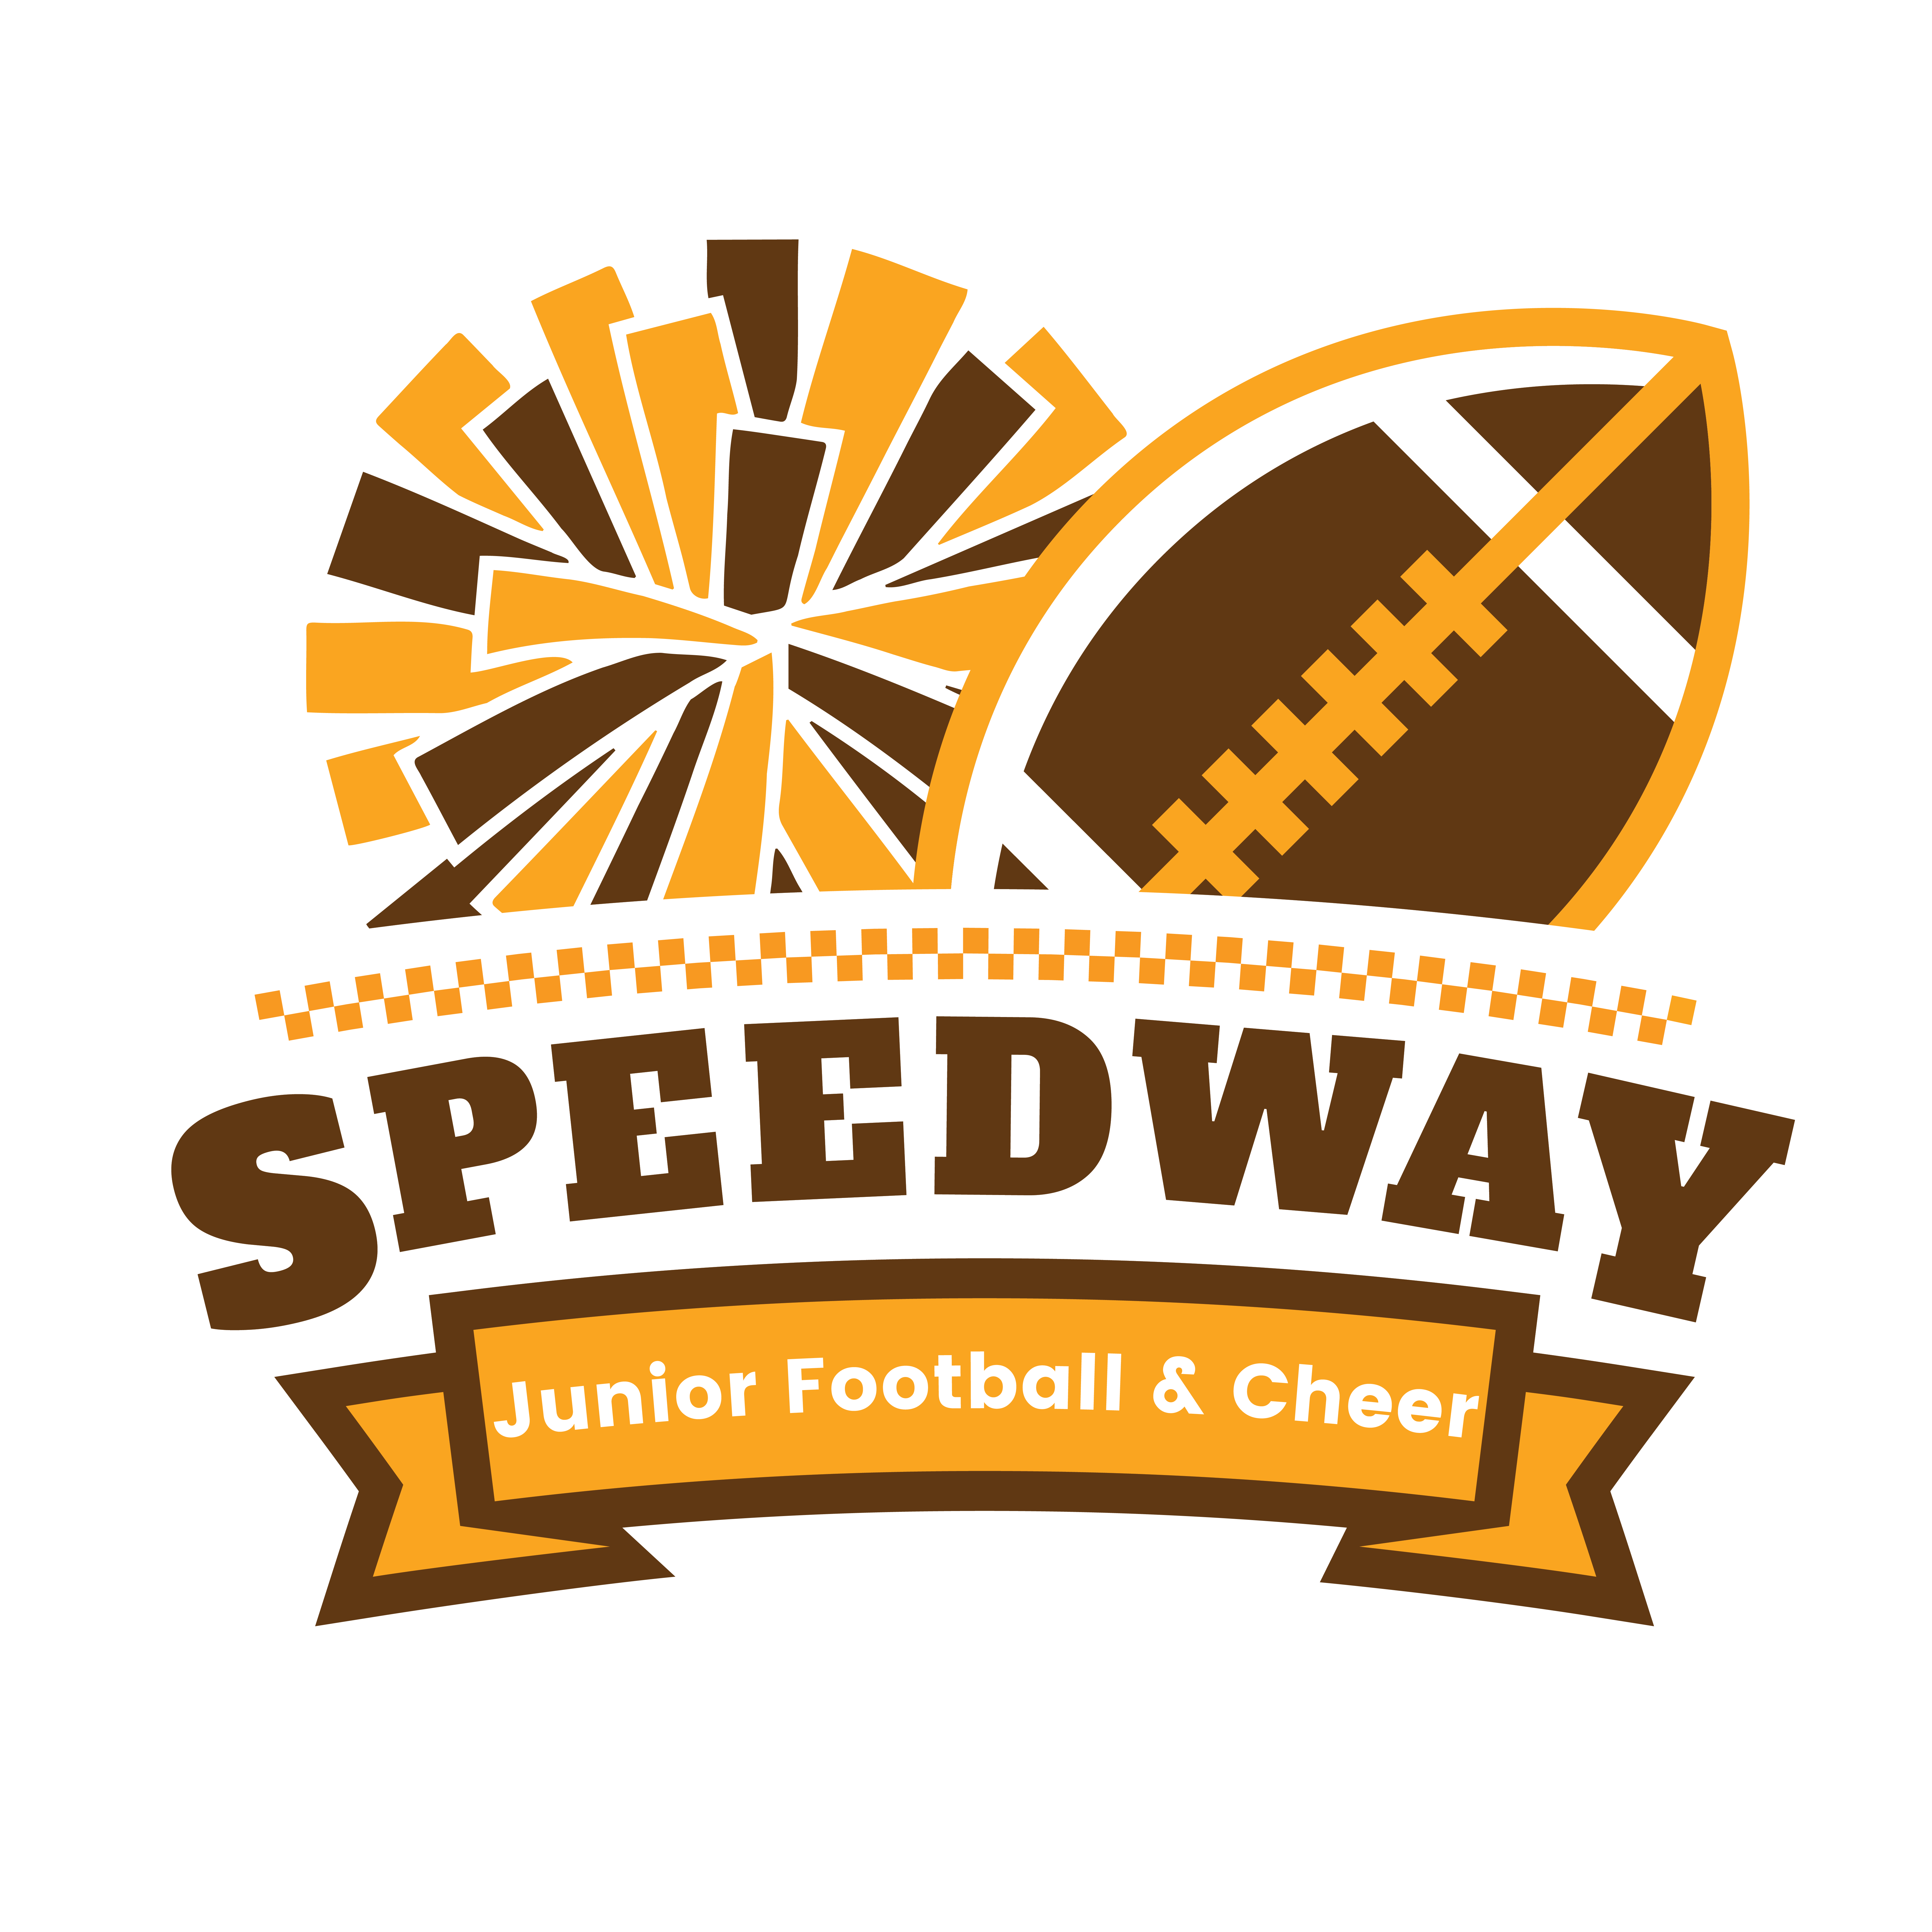 Speedway Junior Football And Cheer Logo